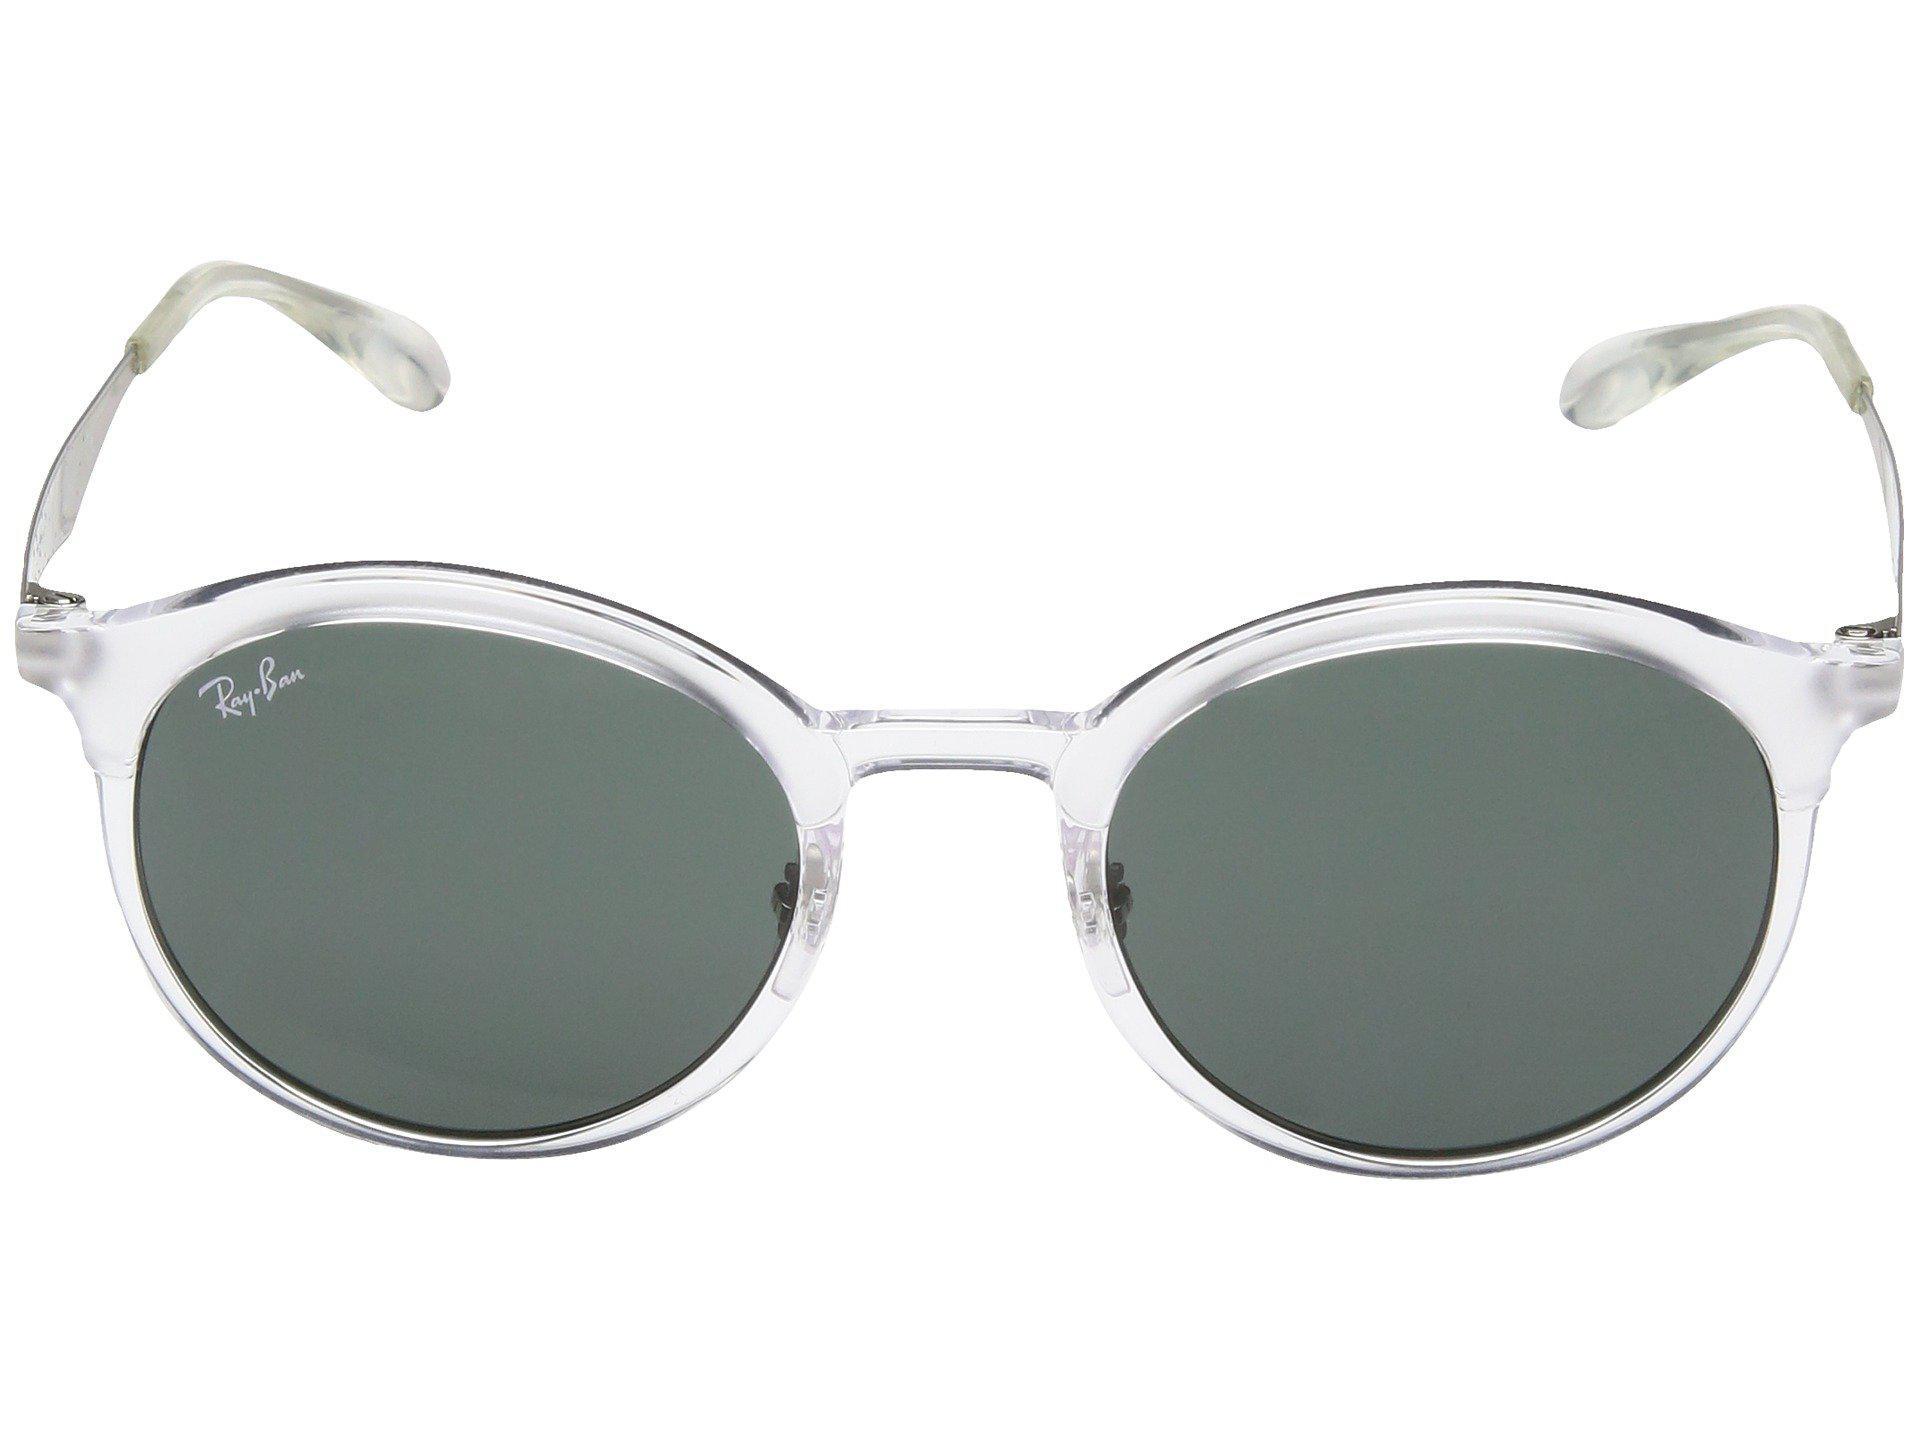 c3c4a5ec237 Ray-Ban - Multicolor Rb4277 Emma 51mm (havana dark Brown) Fashion  Sunglasses. View fullscreen